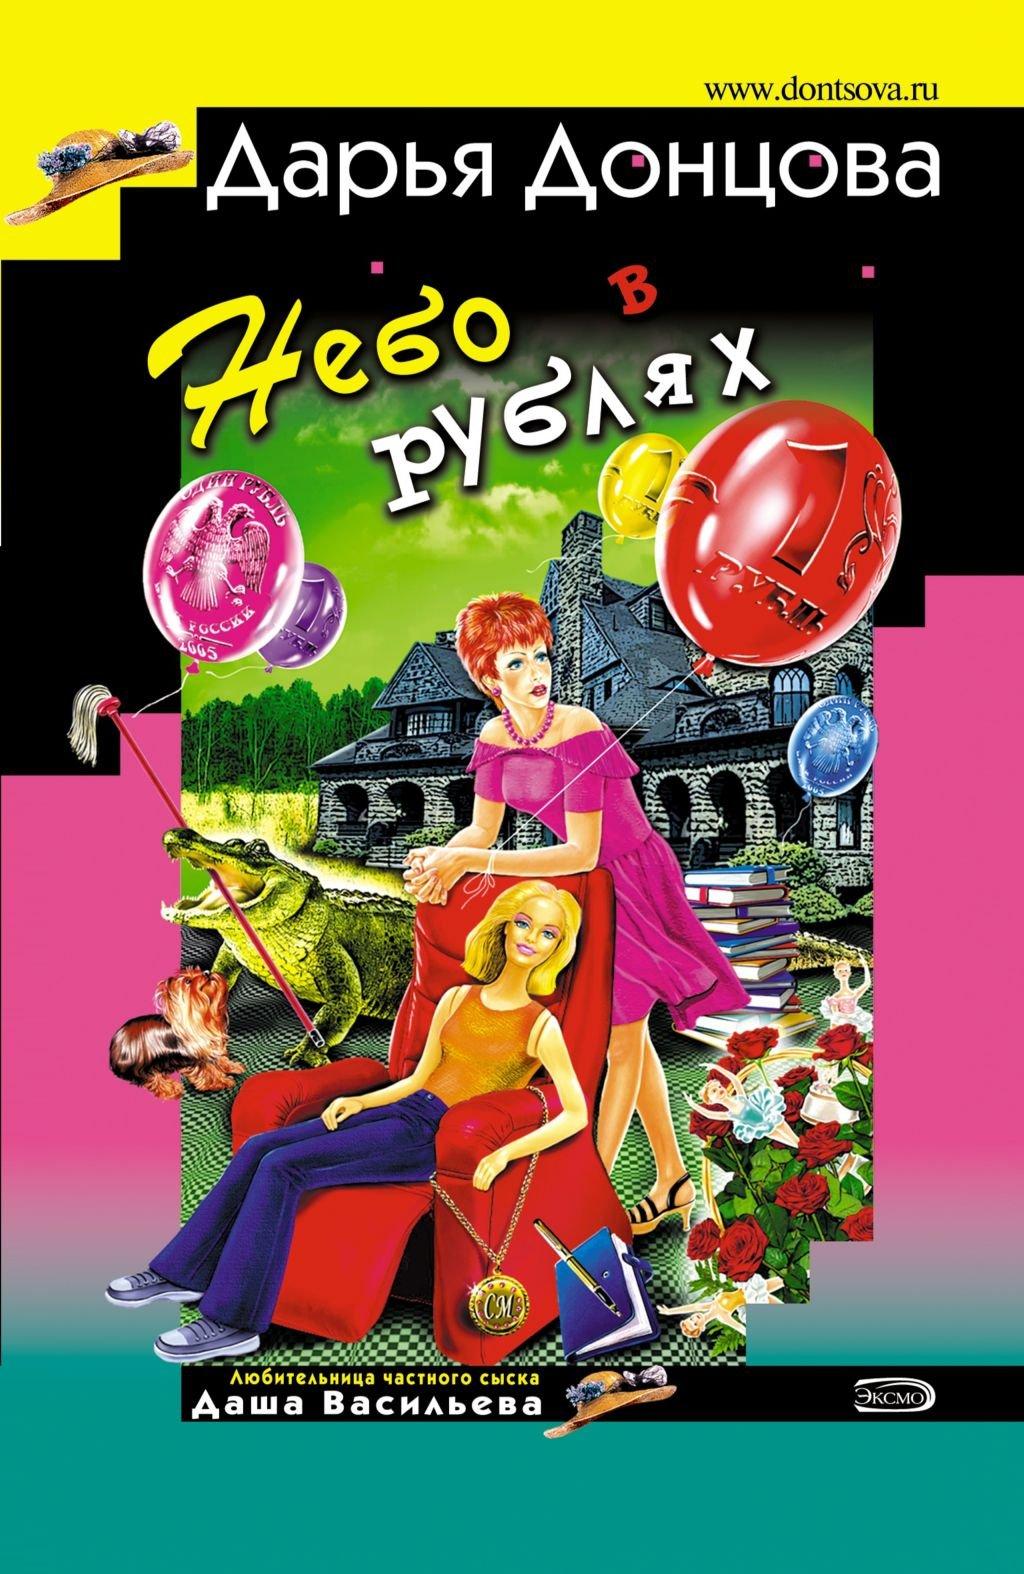 Nebo v rubljah: Ljubitel'nica chastnogo syska Dasha Vasil'eva #26 (Russian Edition) PDF